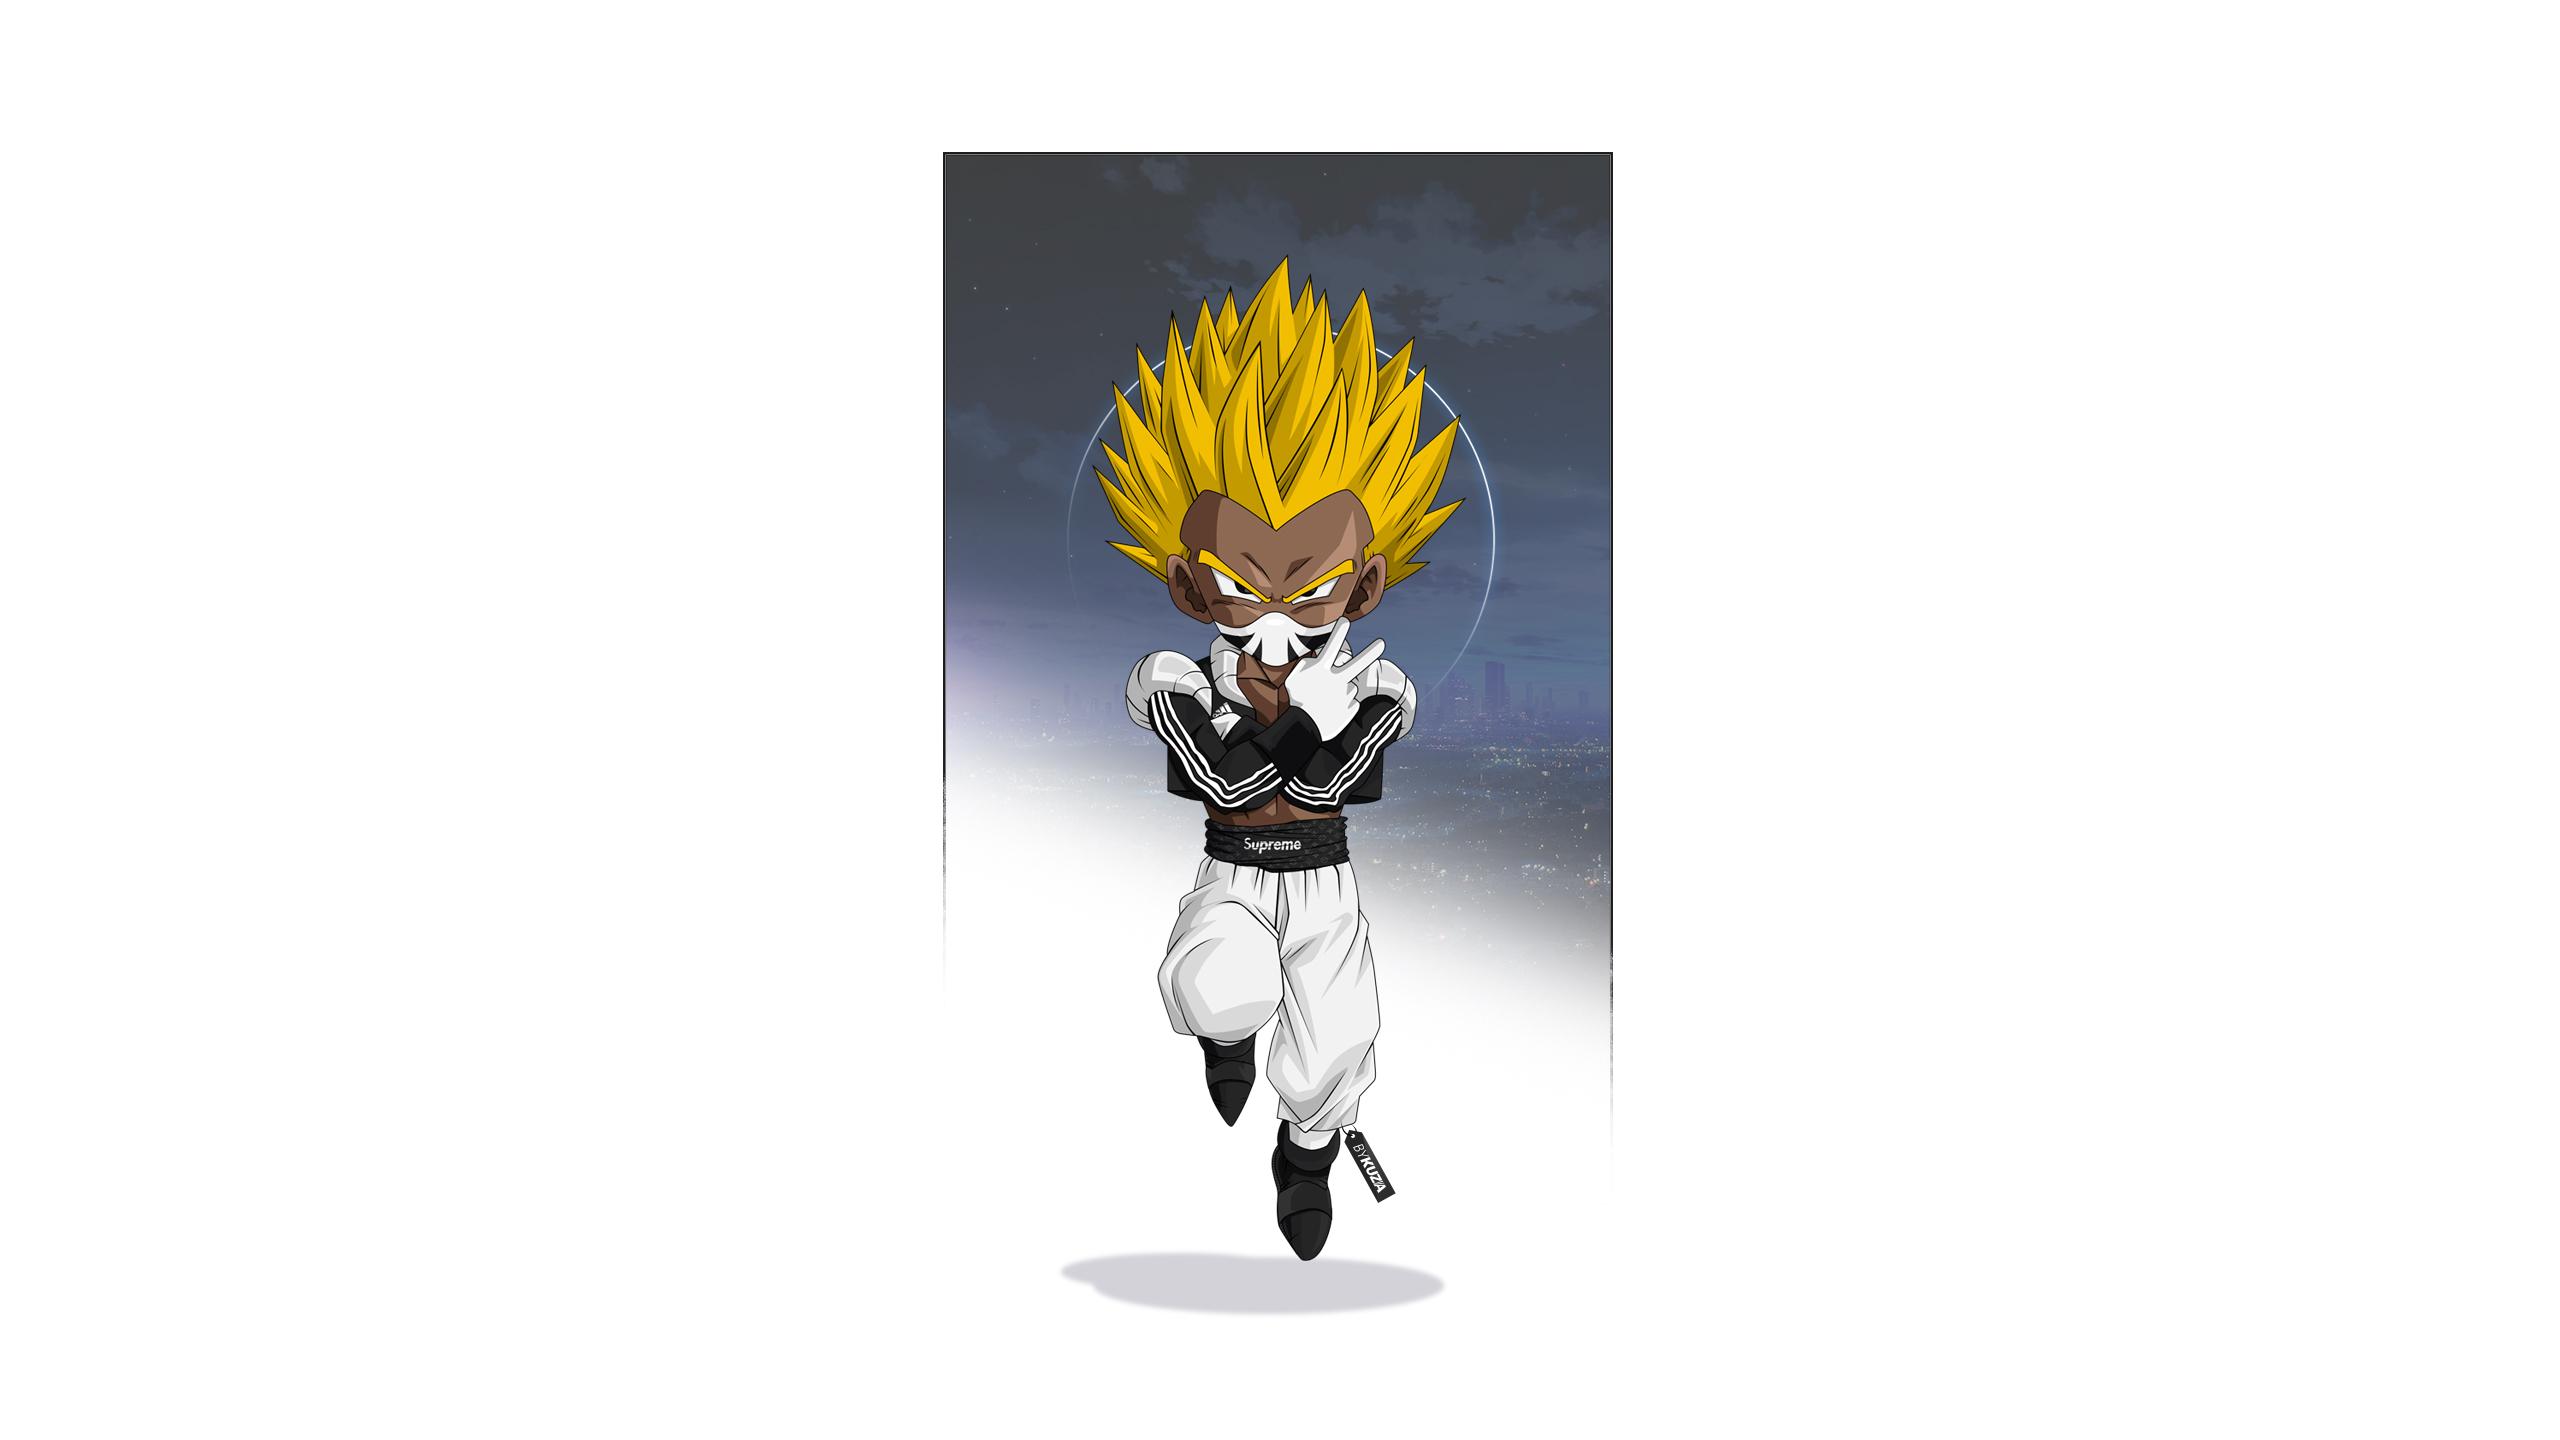 Anime 2560x1440 Gotenks Dragon Ball Z Dragon Ball illustration artwork Adidas supreme